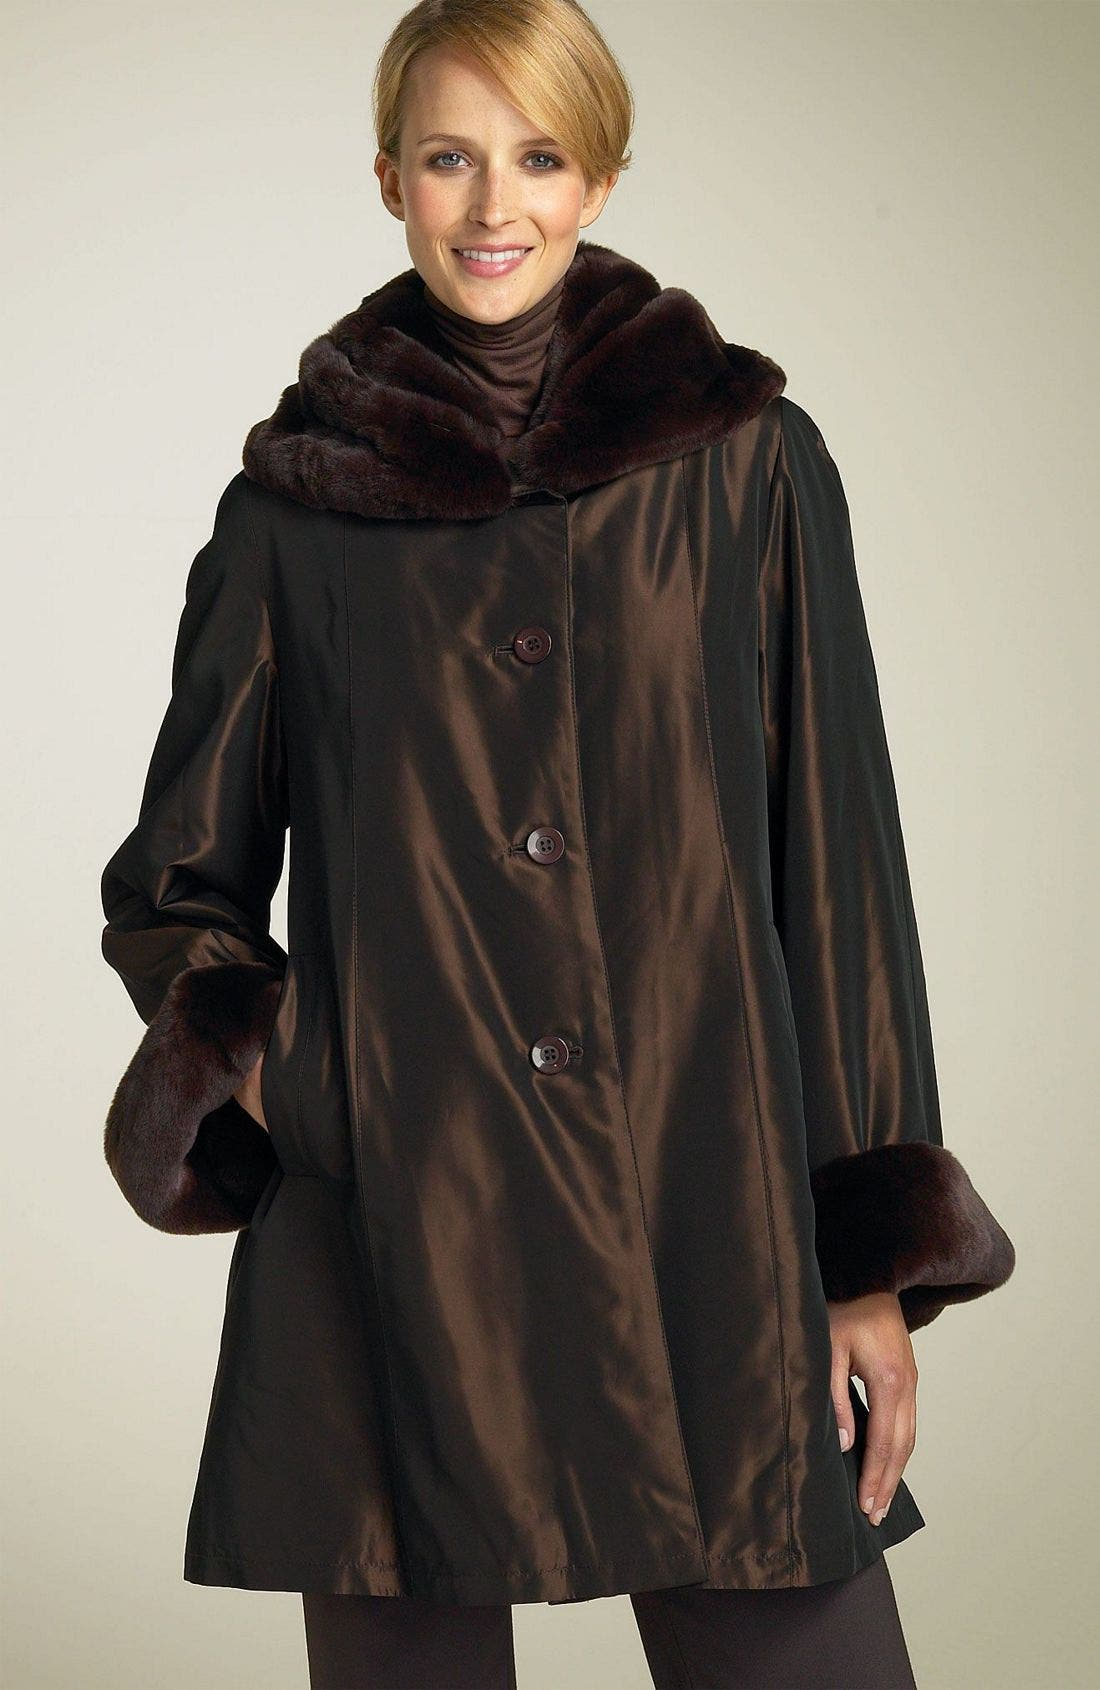 Main Image - Chosen Furs All Weather Jacket with Rabbit Fur